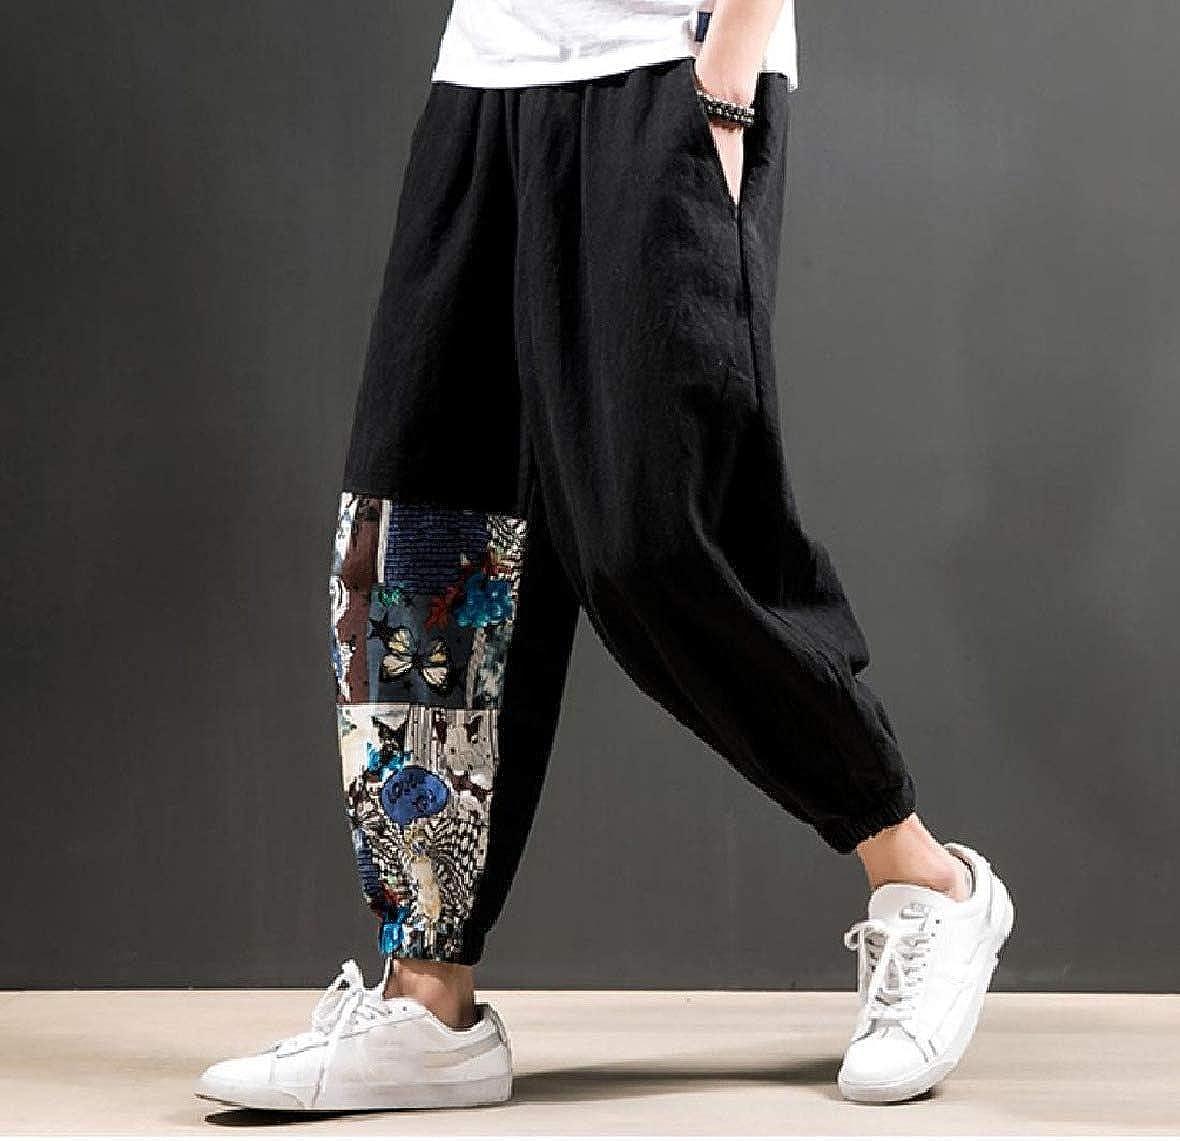 HEFASDM Mens Beam Foot Trousers Linen Waistband Stretchy Stitch Tenths Pants